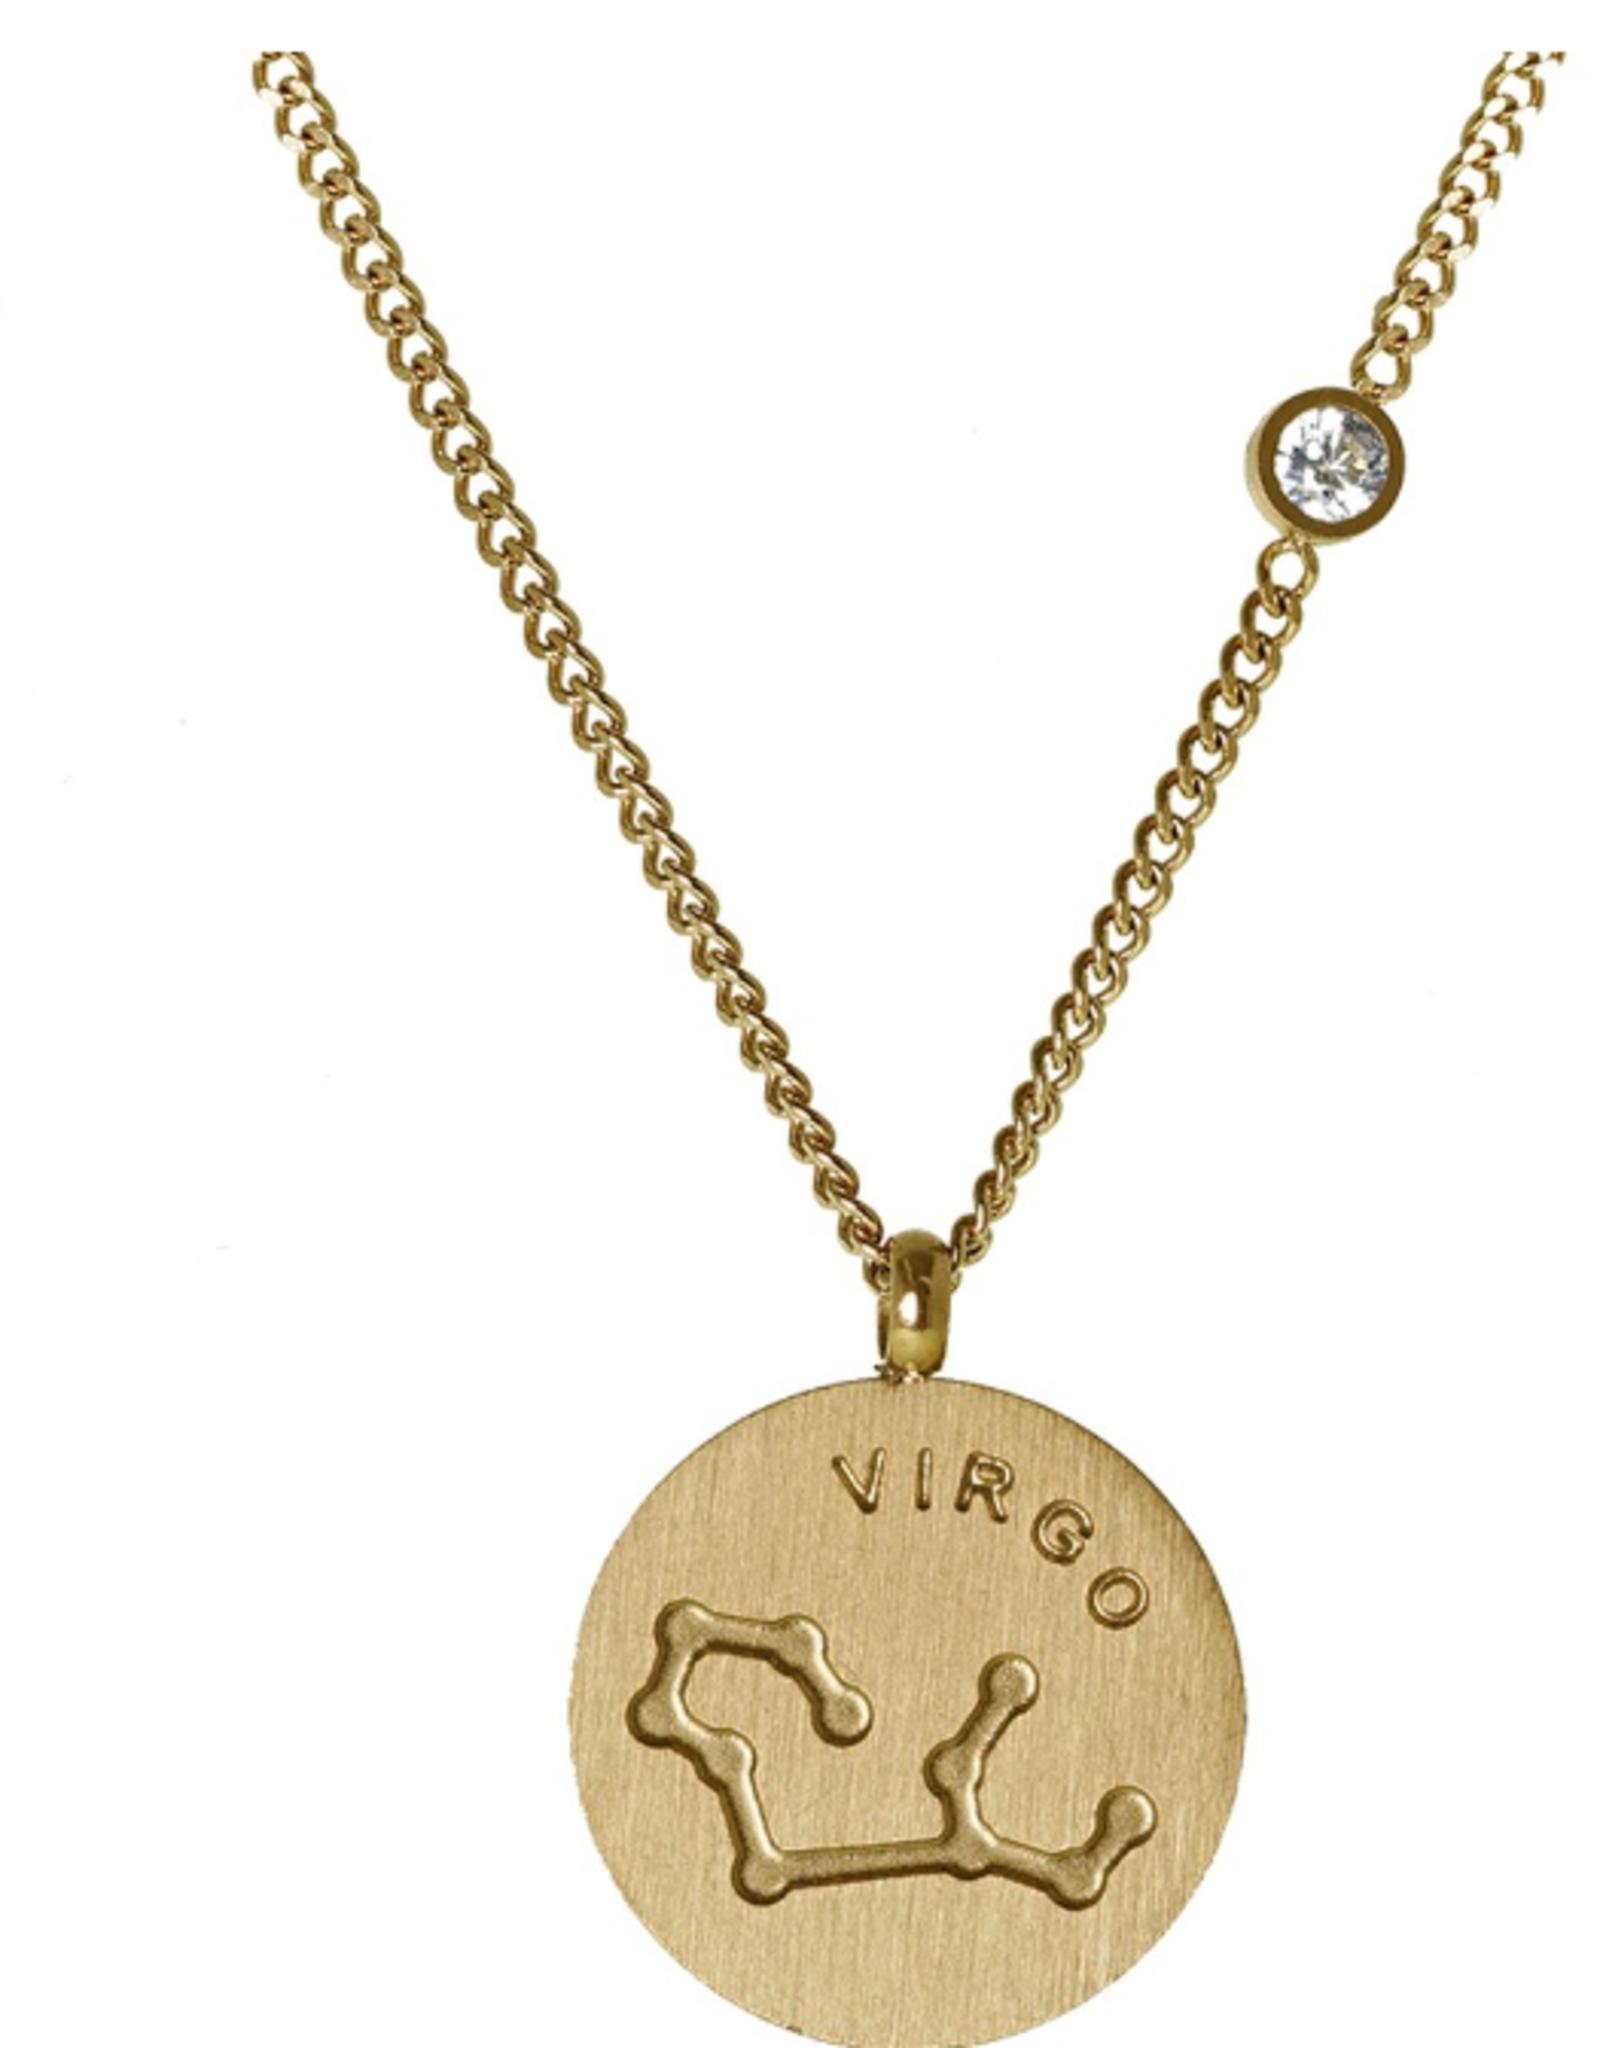 Gold Virgo Necklace